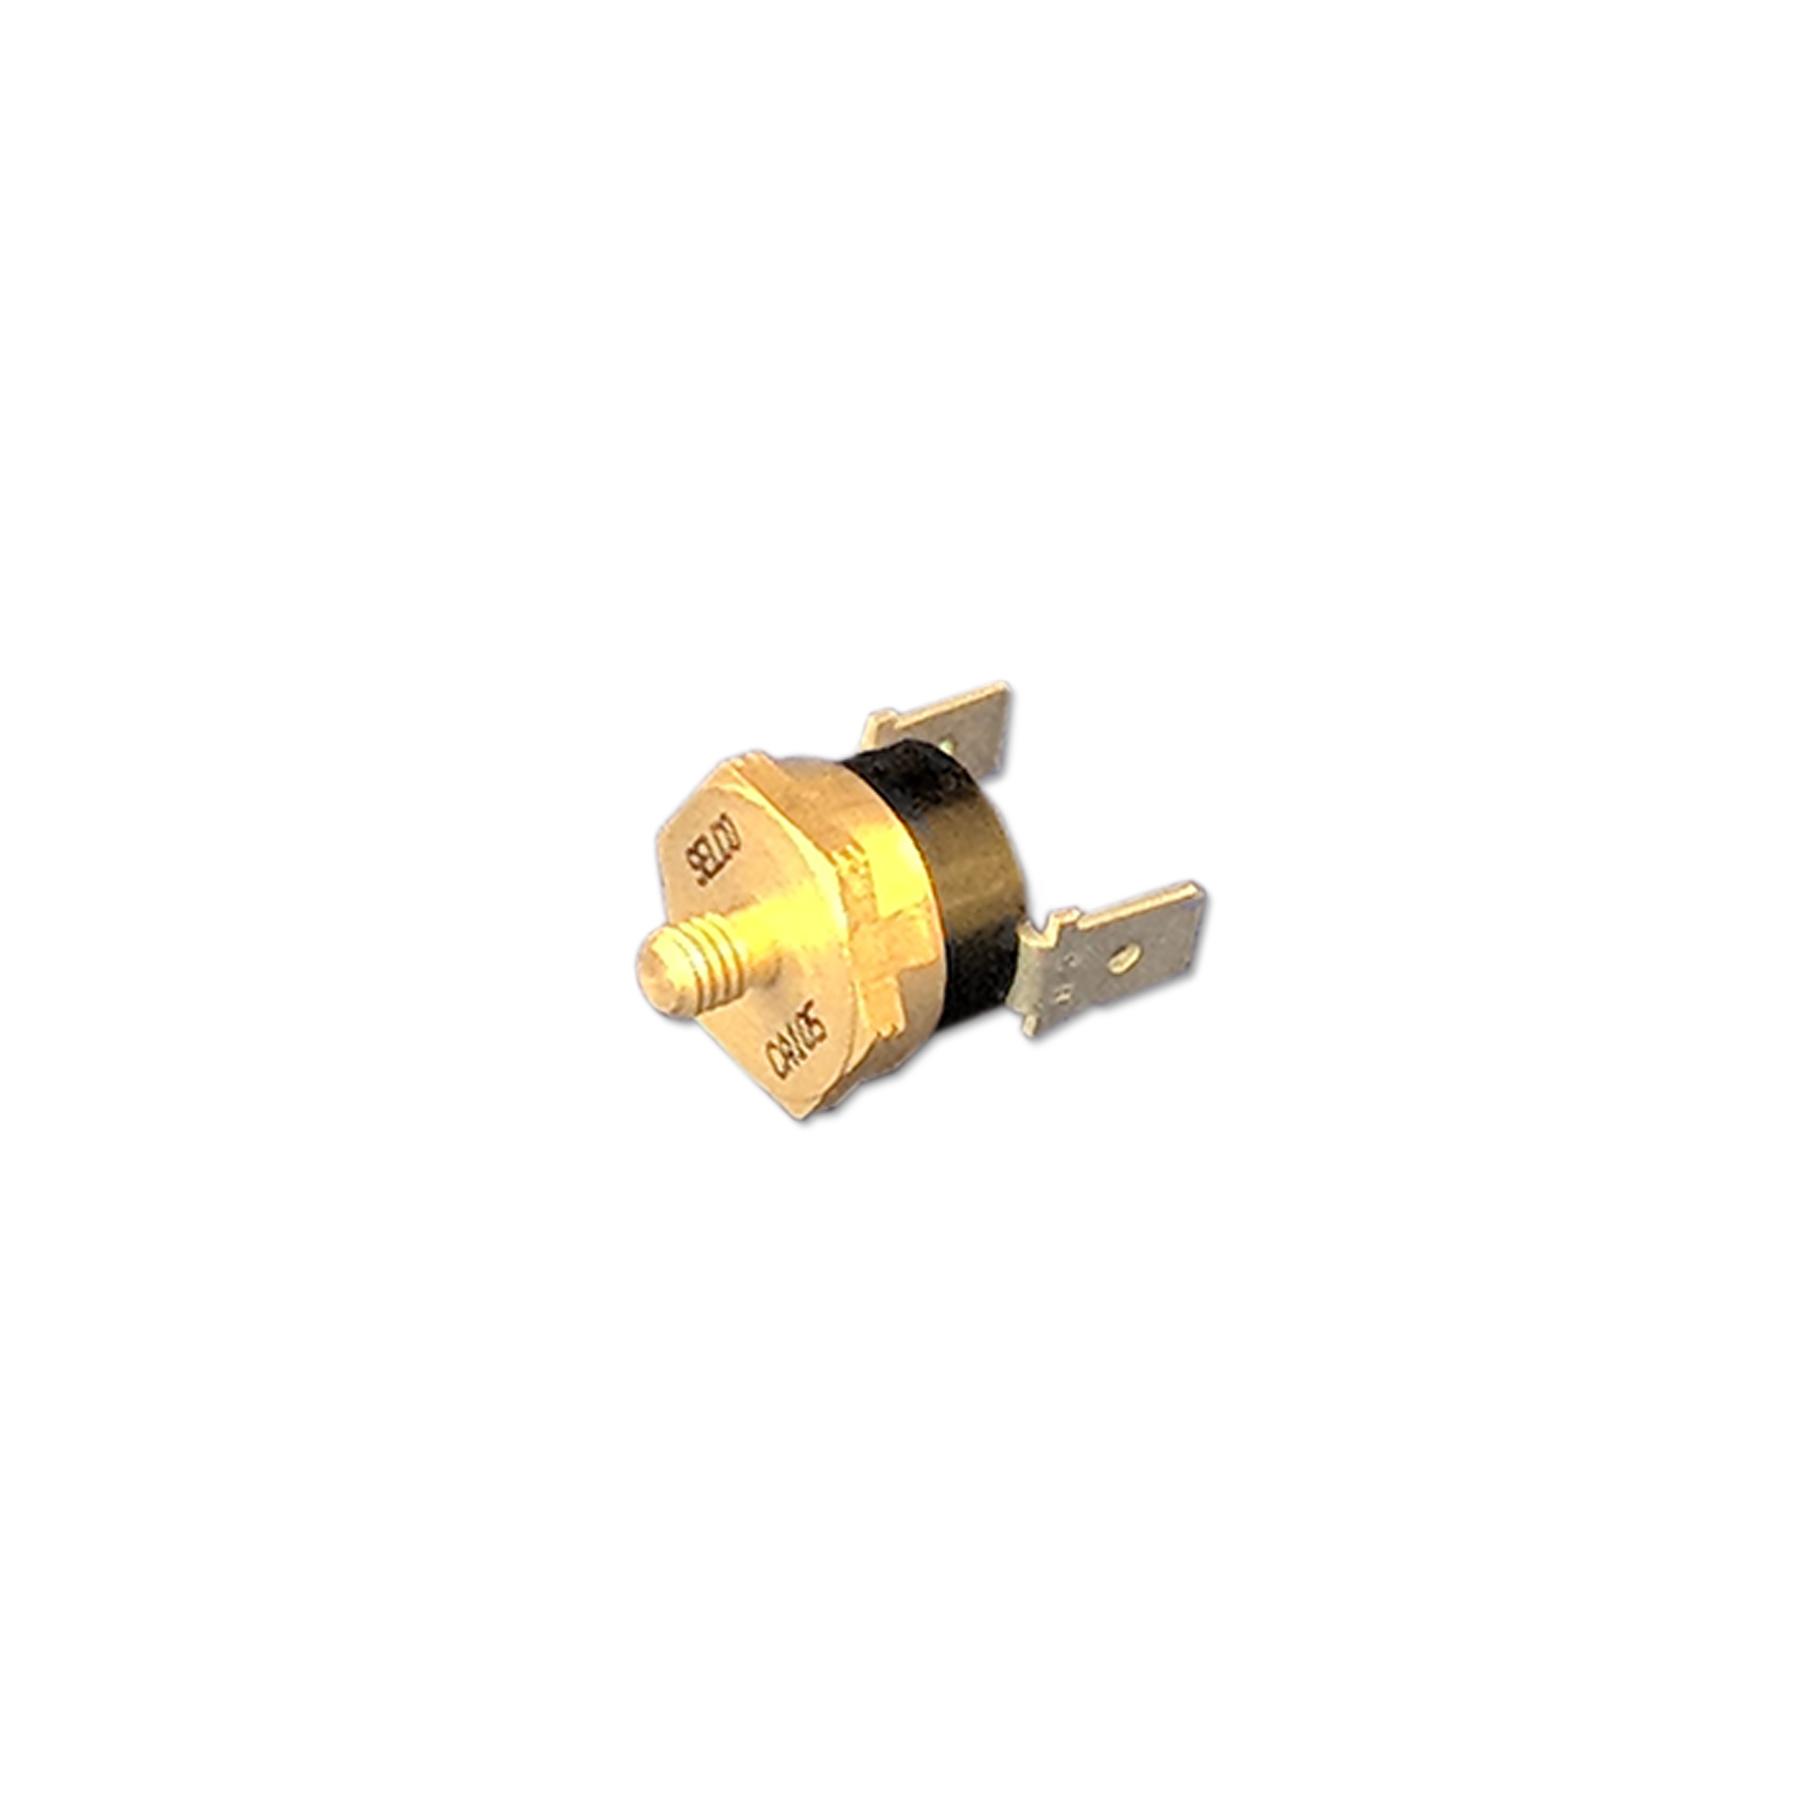 Low Temp Cut-Off Thermostat w/ Spade Connectors